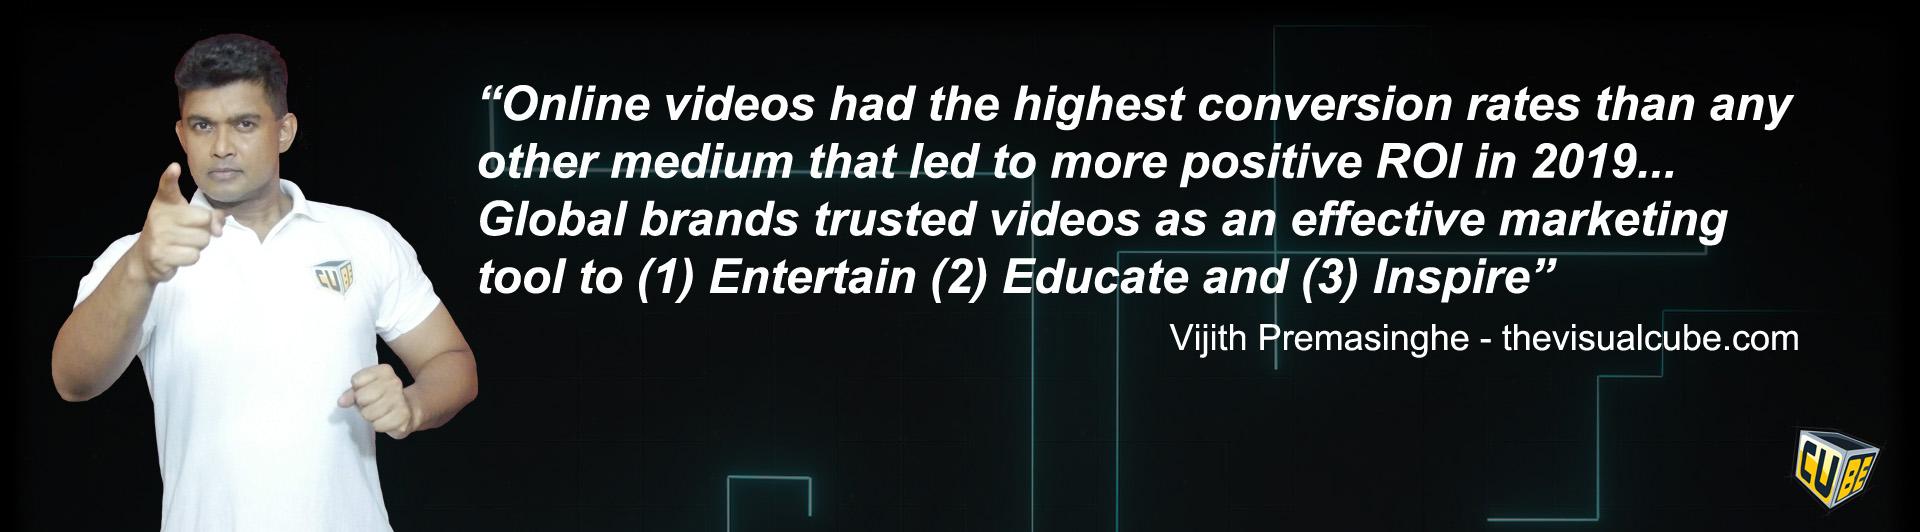 video marketing quotes vijith premasinghe quotes 2020